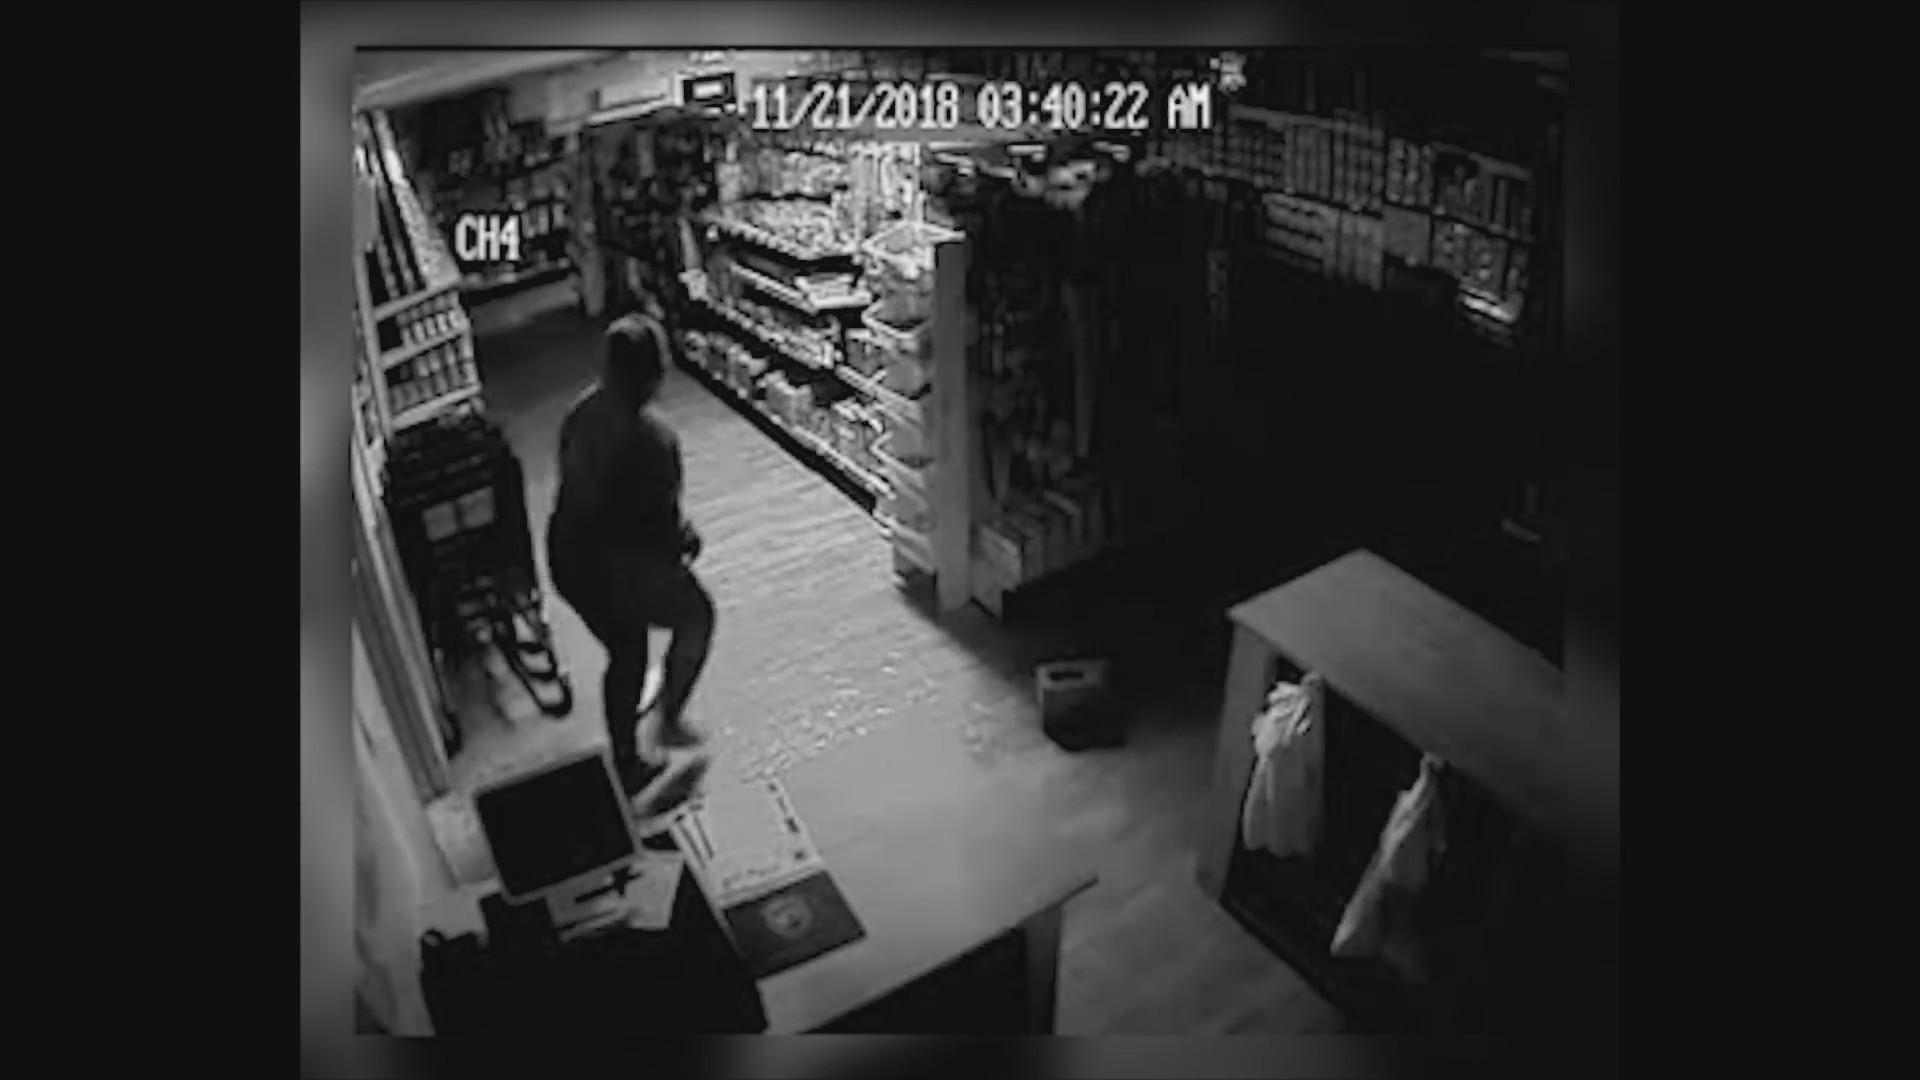 Fireworks_robbery_0_20181122225841